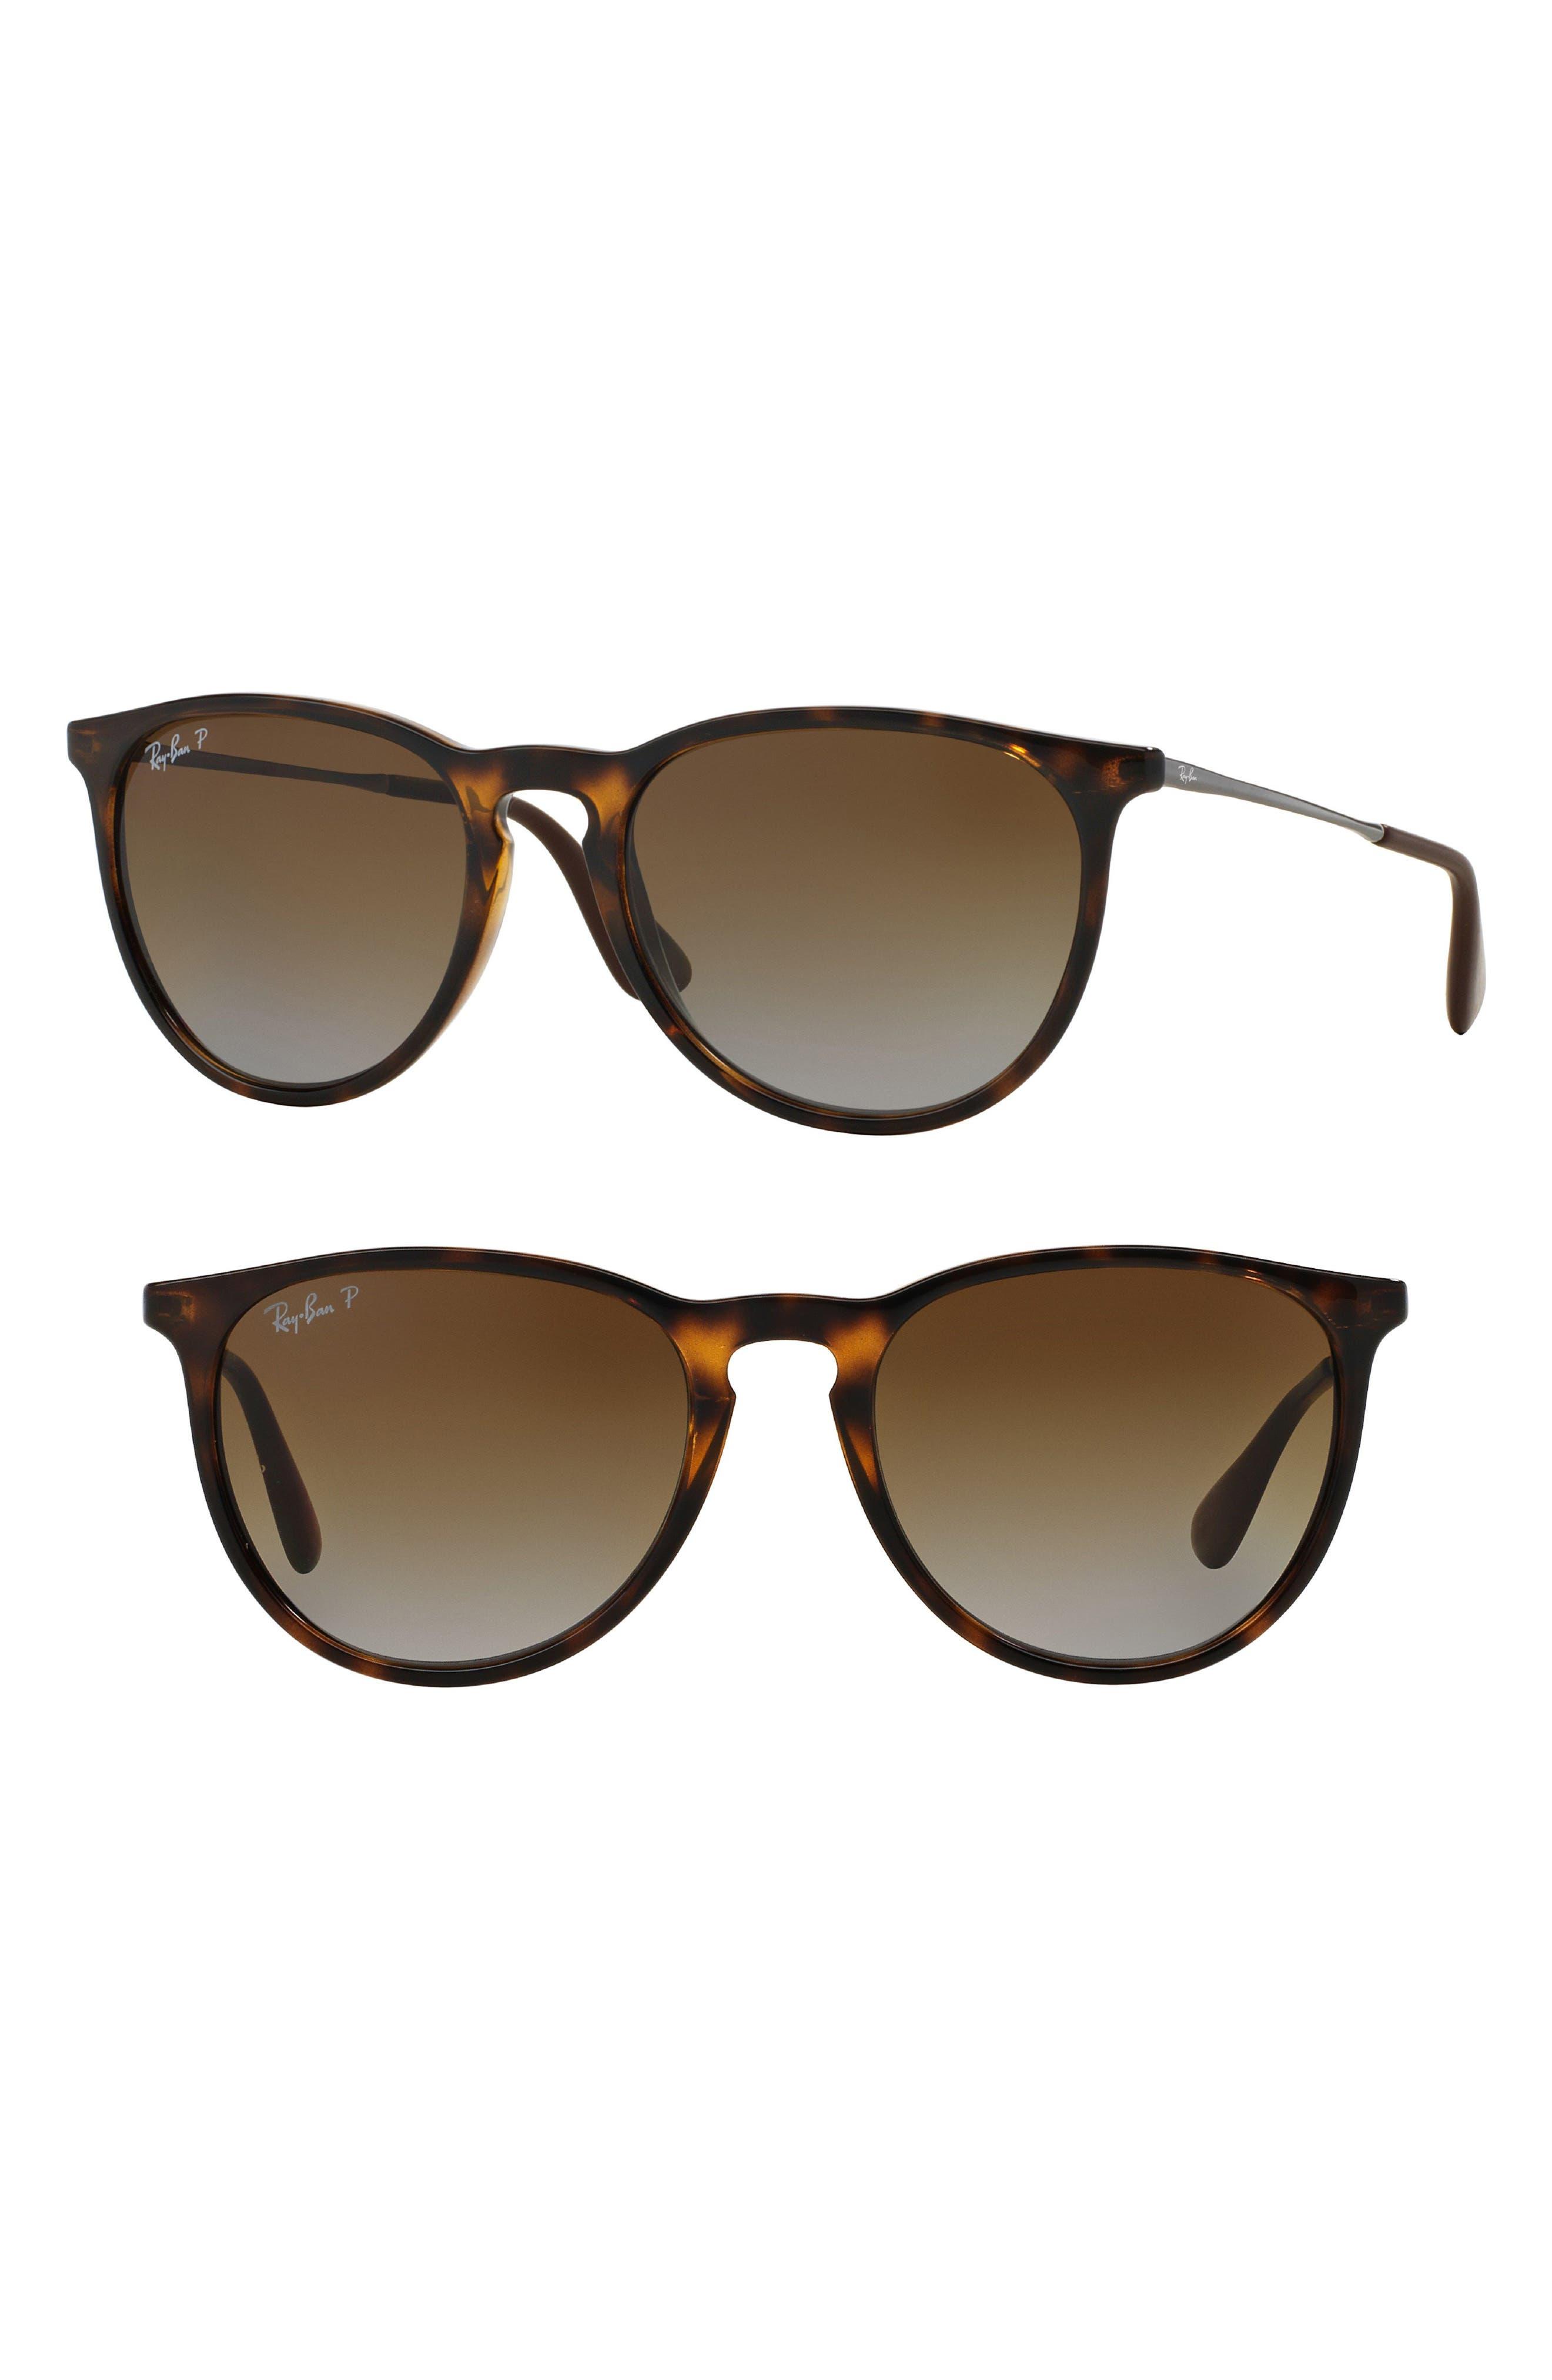 RAY-BAN, Erika Classic 54mm Sunglasses, Main thumbnail 1, color, HAVANA